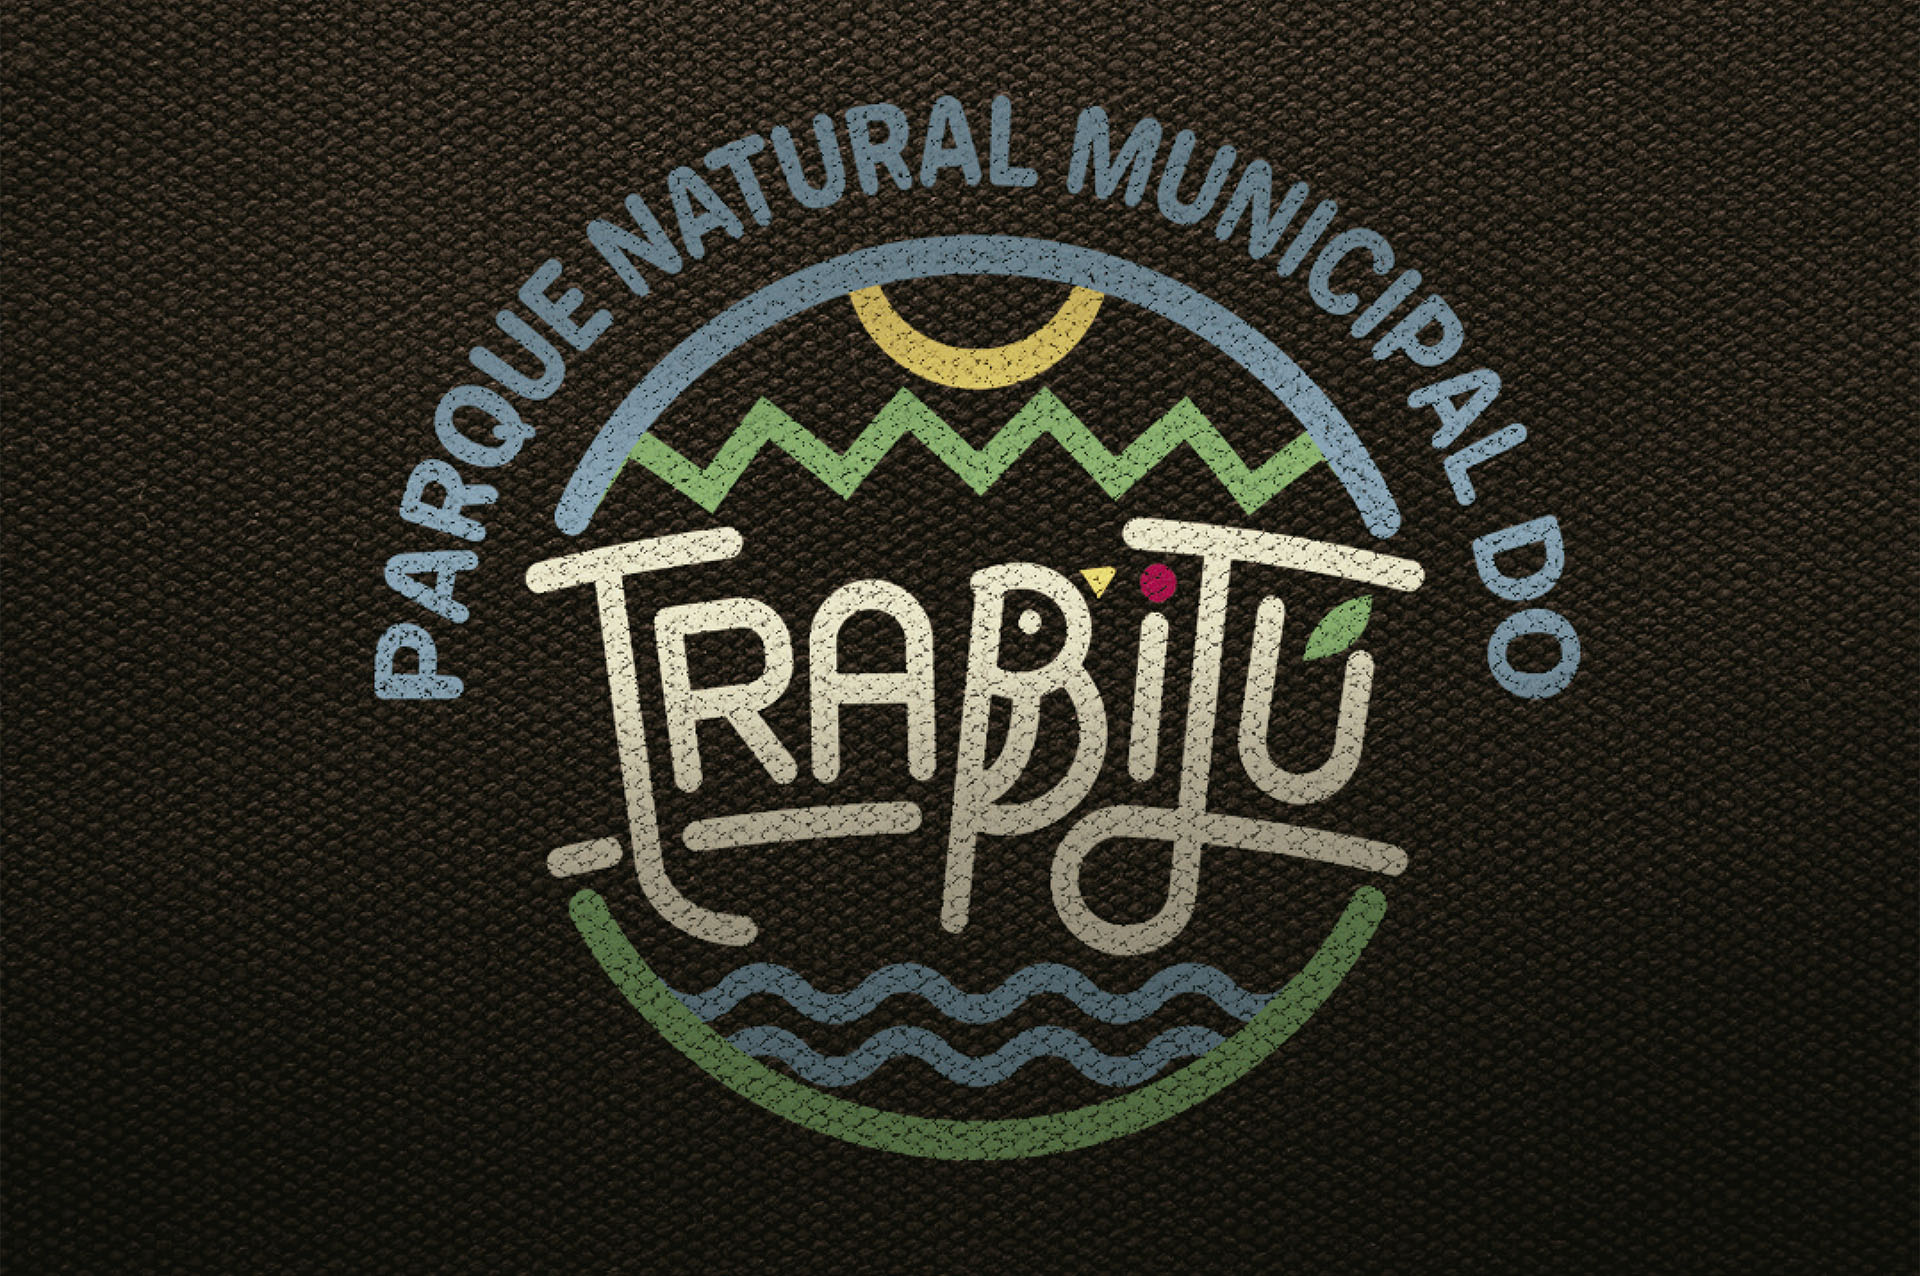 Logotipo Preferencial do Parque Natural Municipal do Trabijú